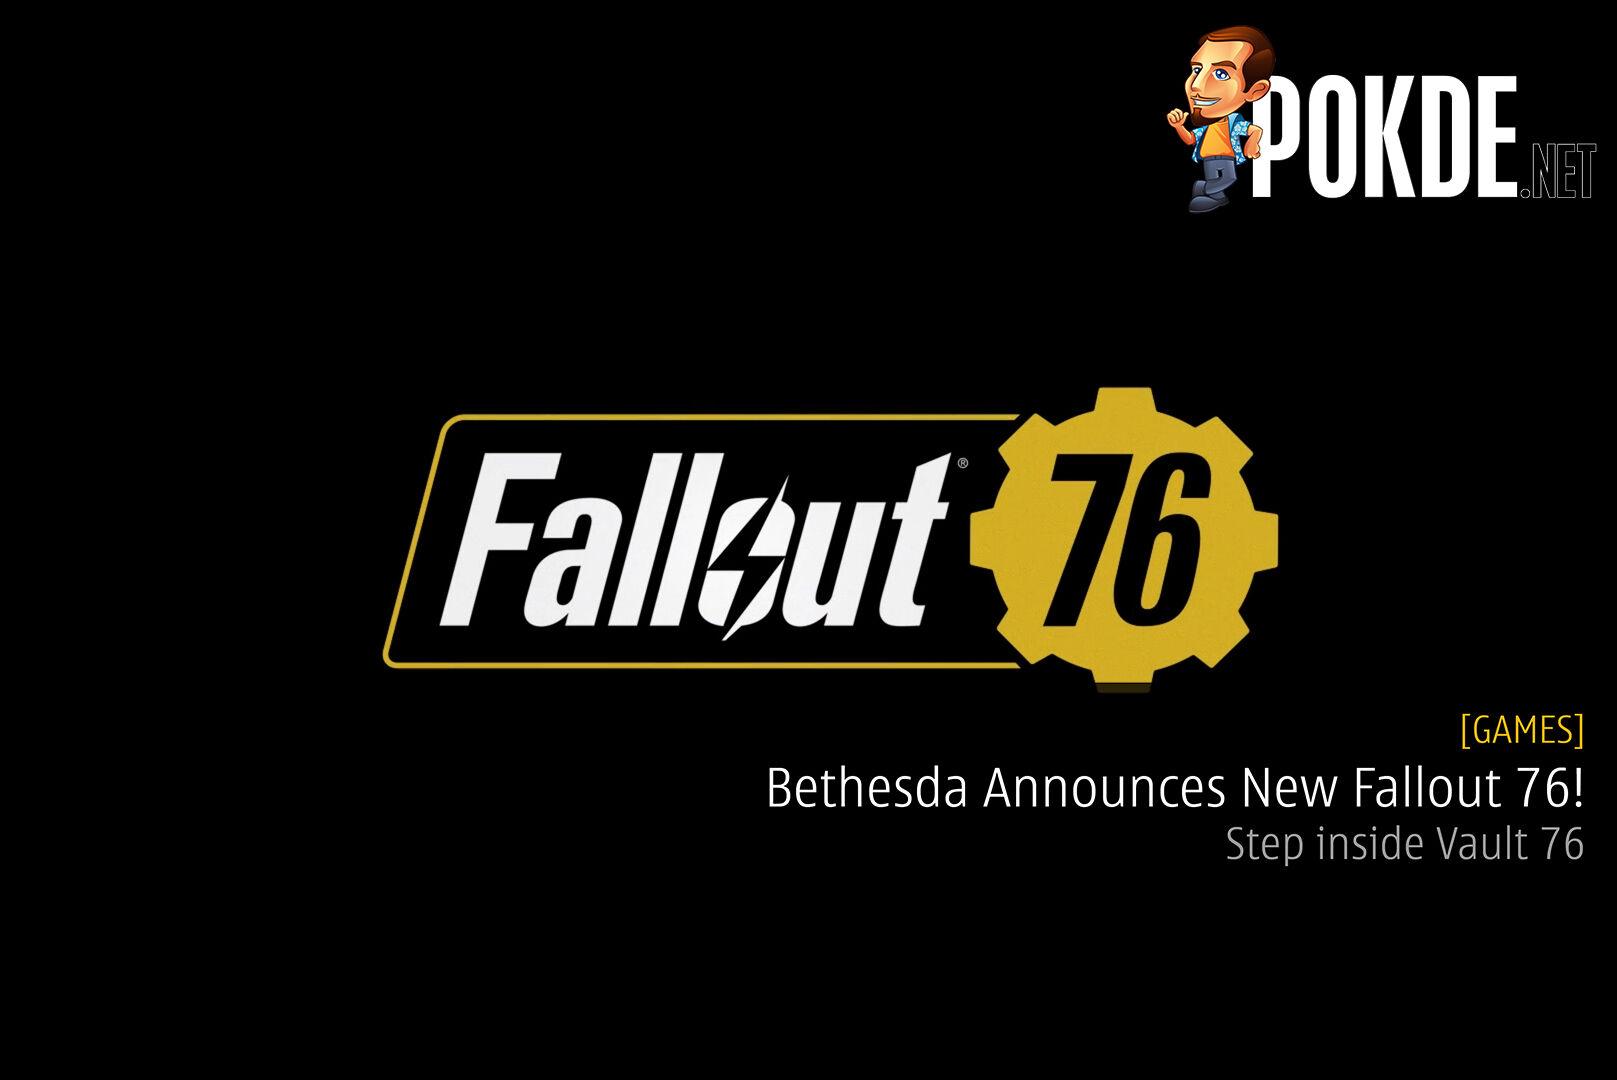 Bethesda Announces New Fallout 76! 29